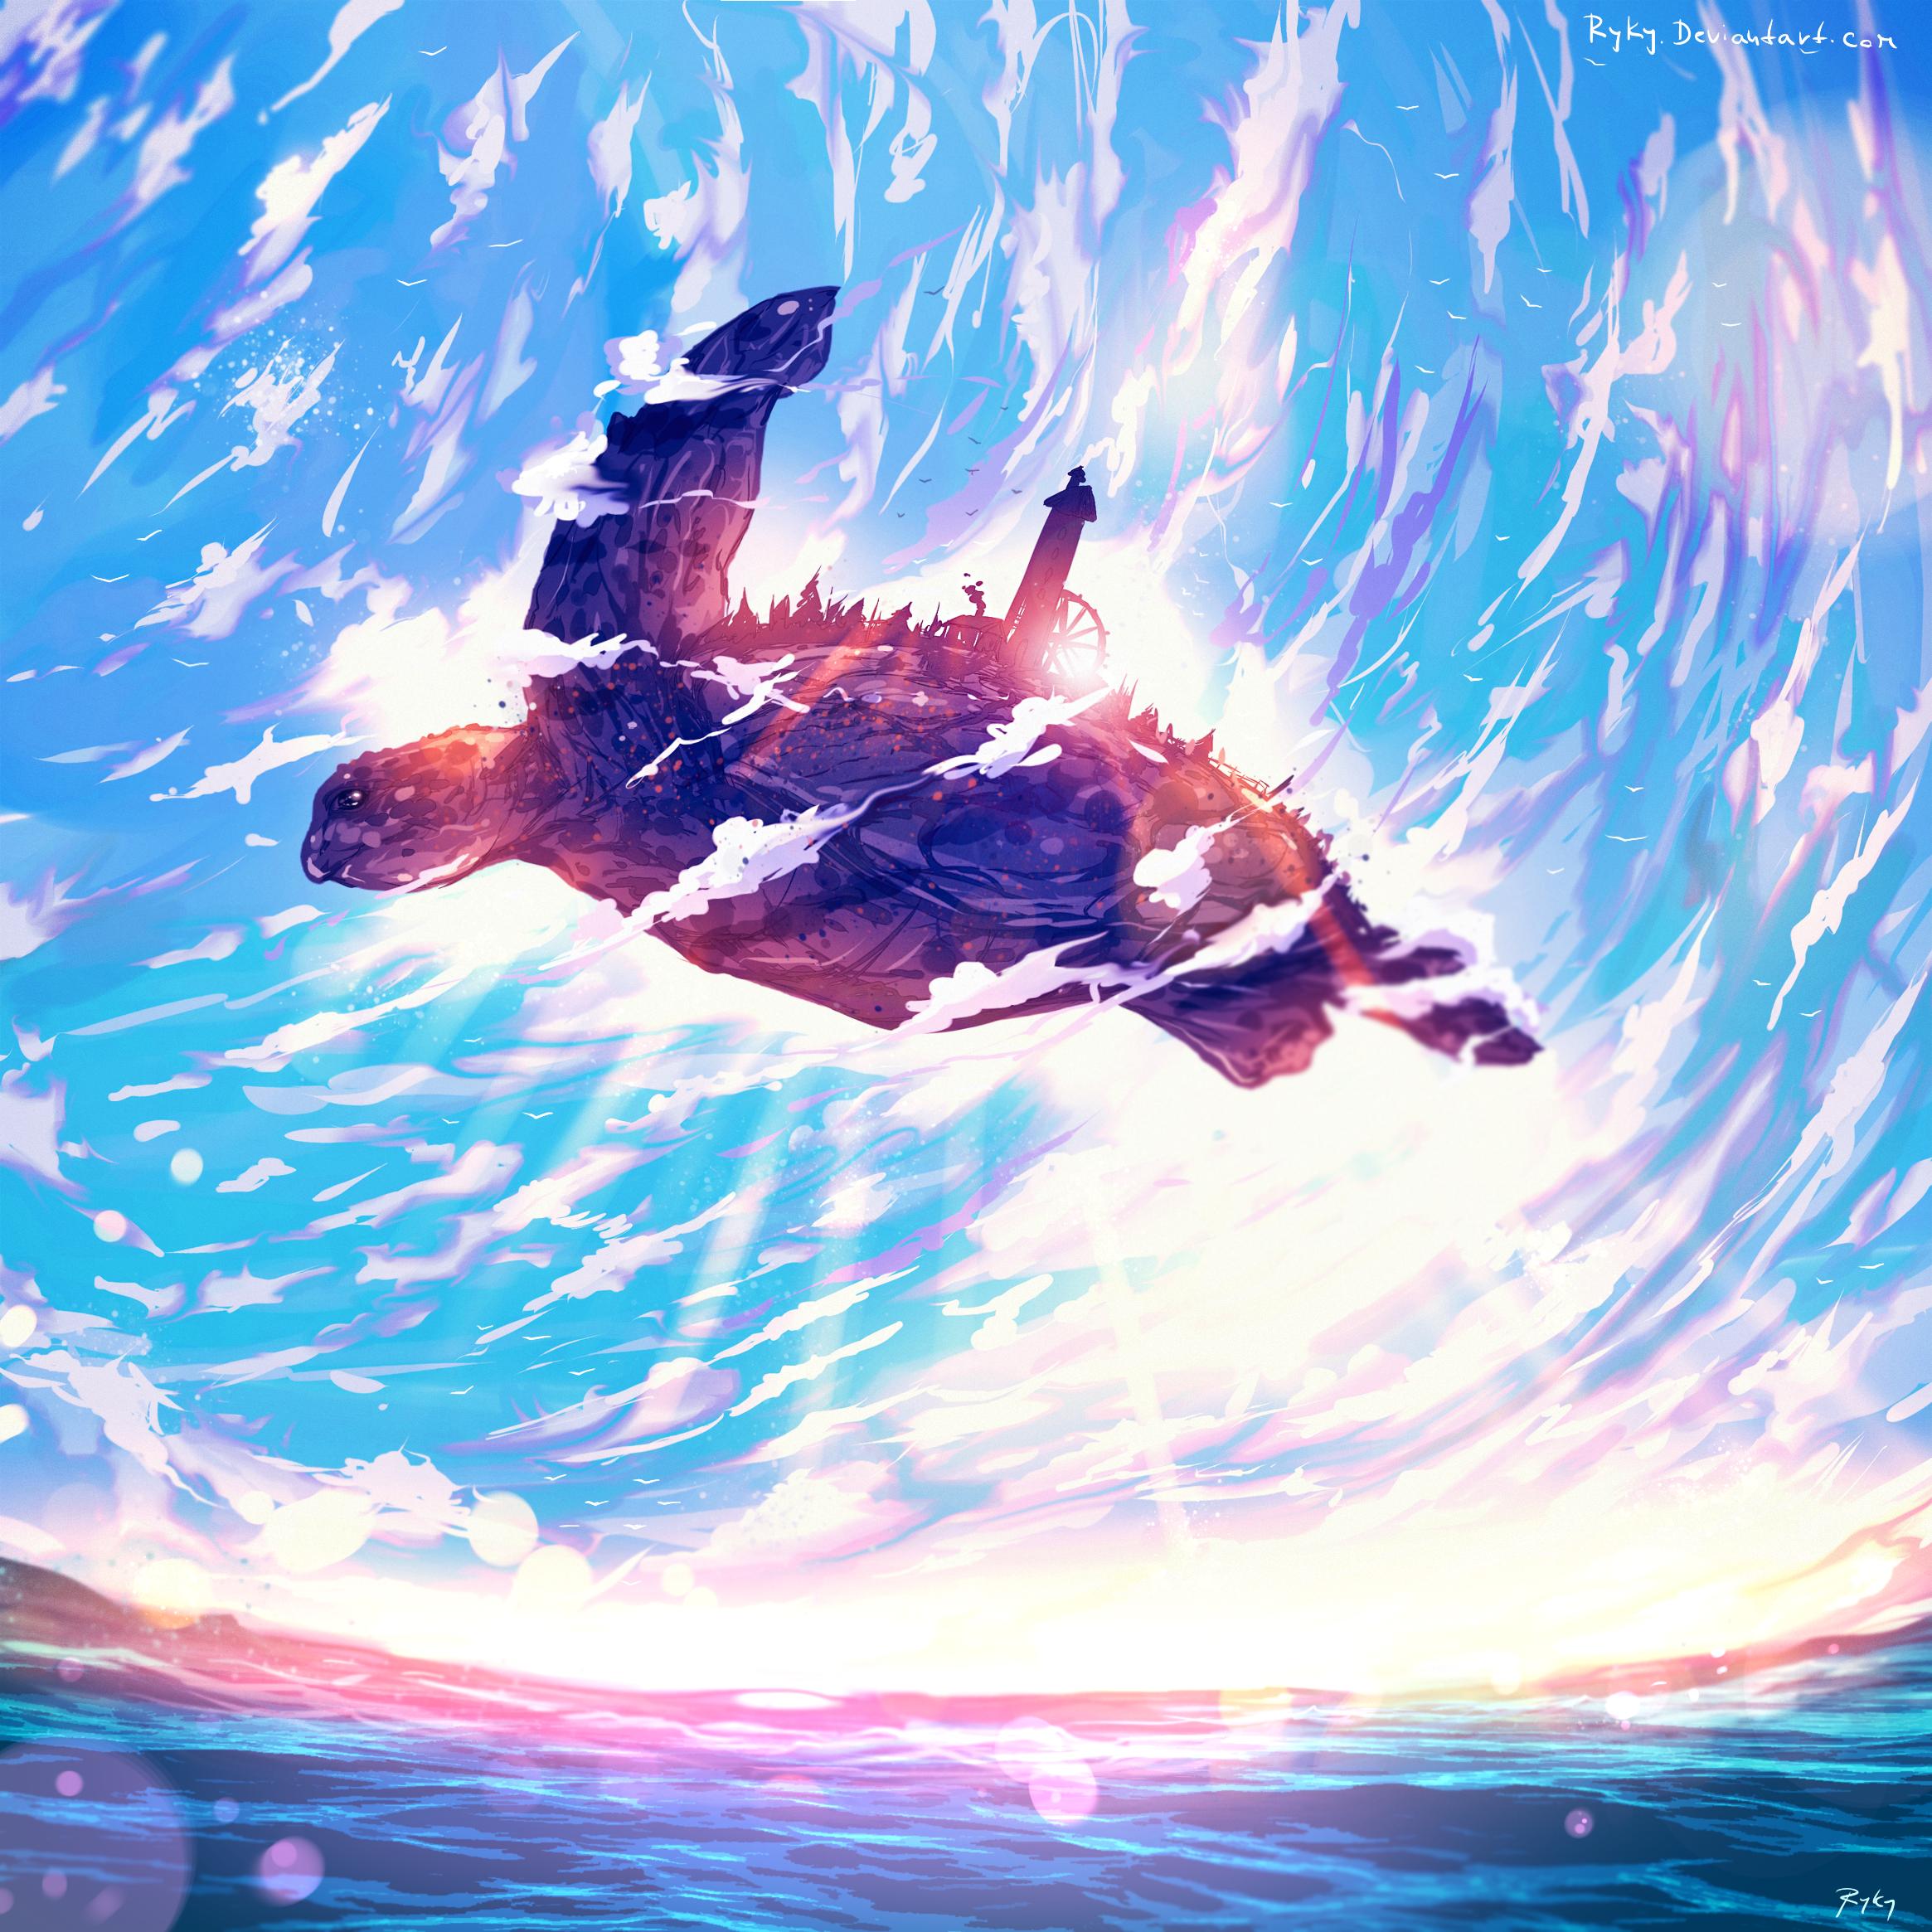 Flying Village by ryky